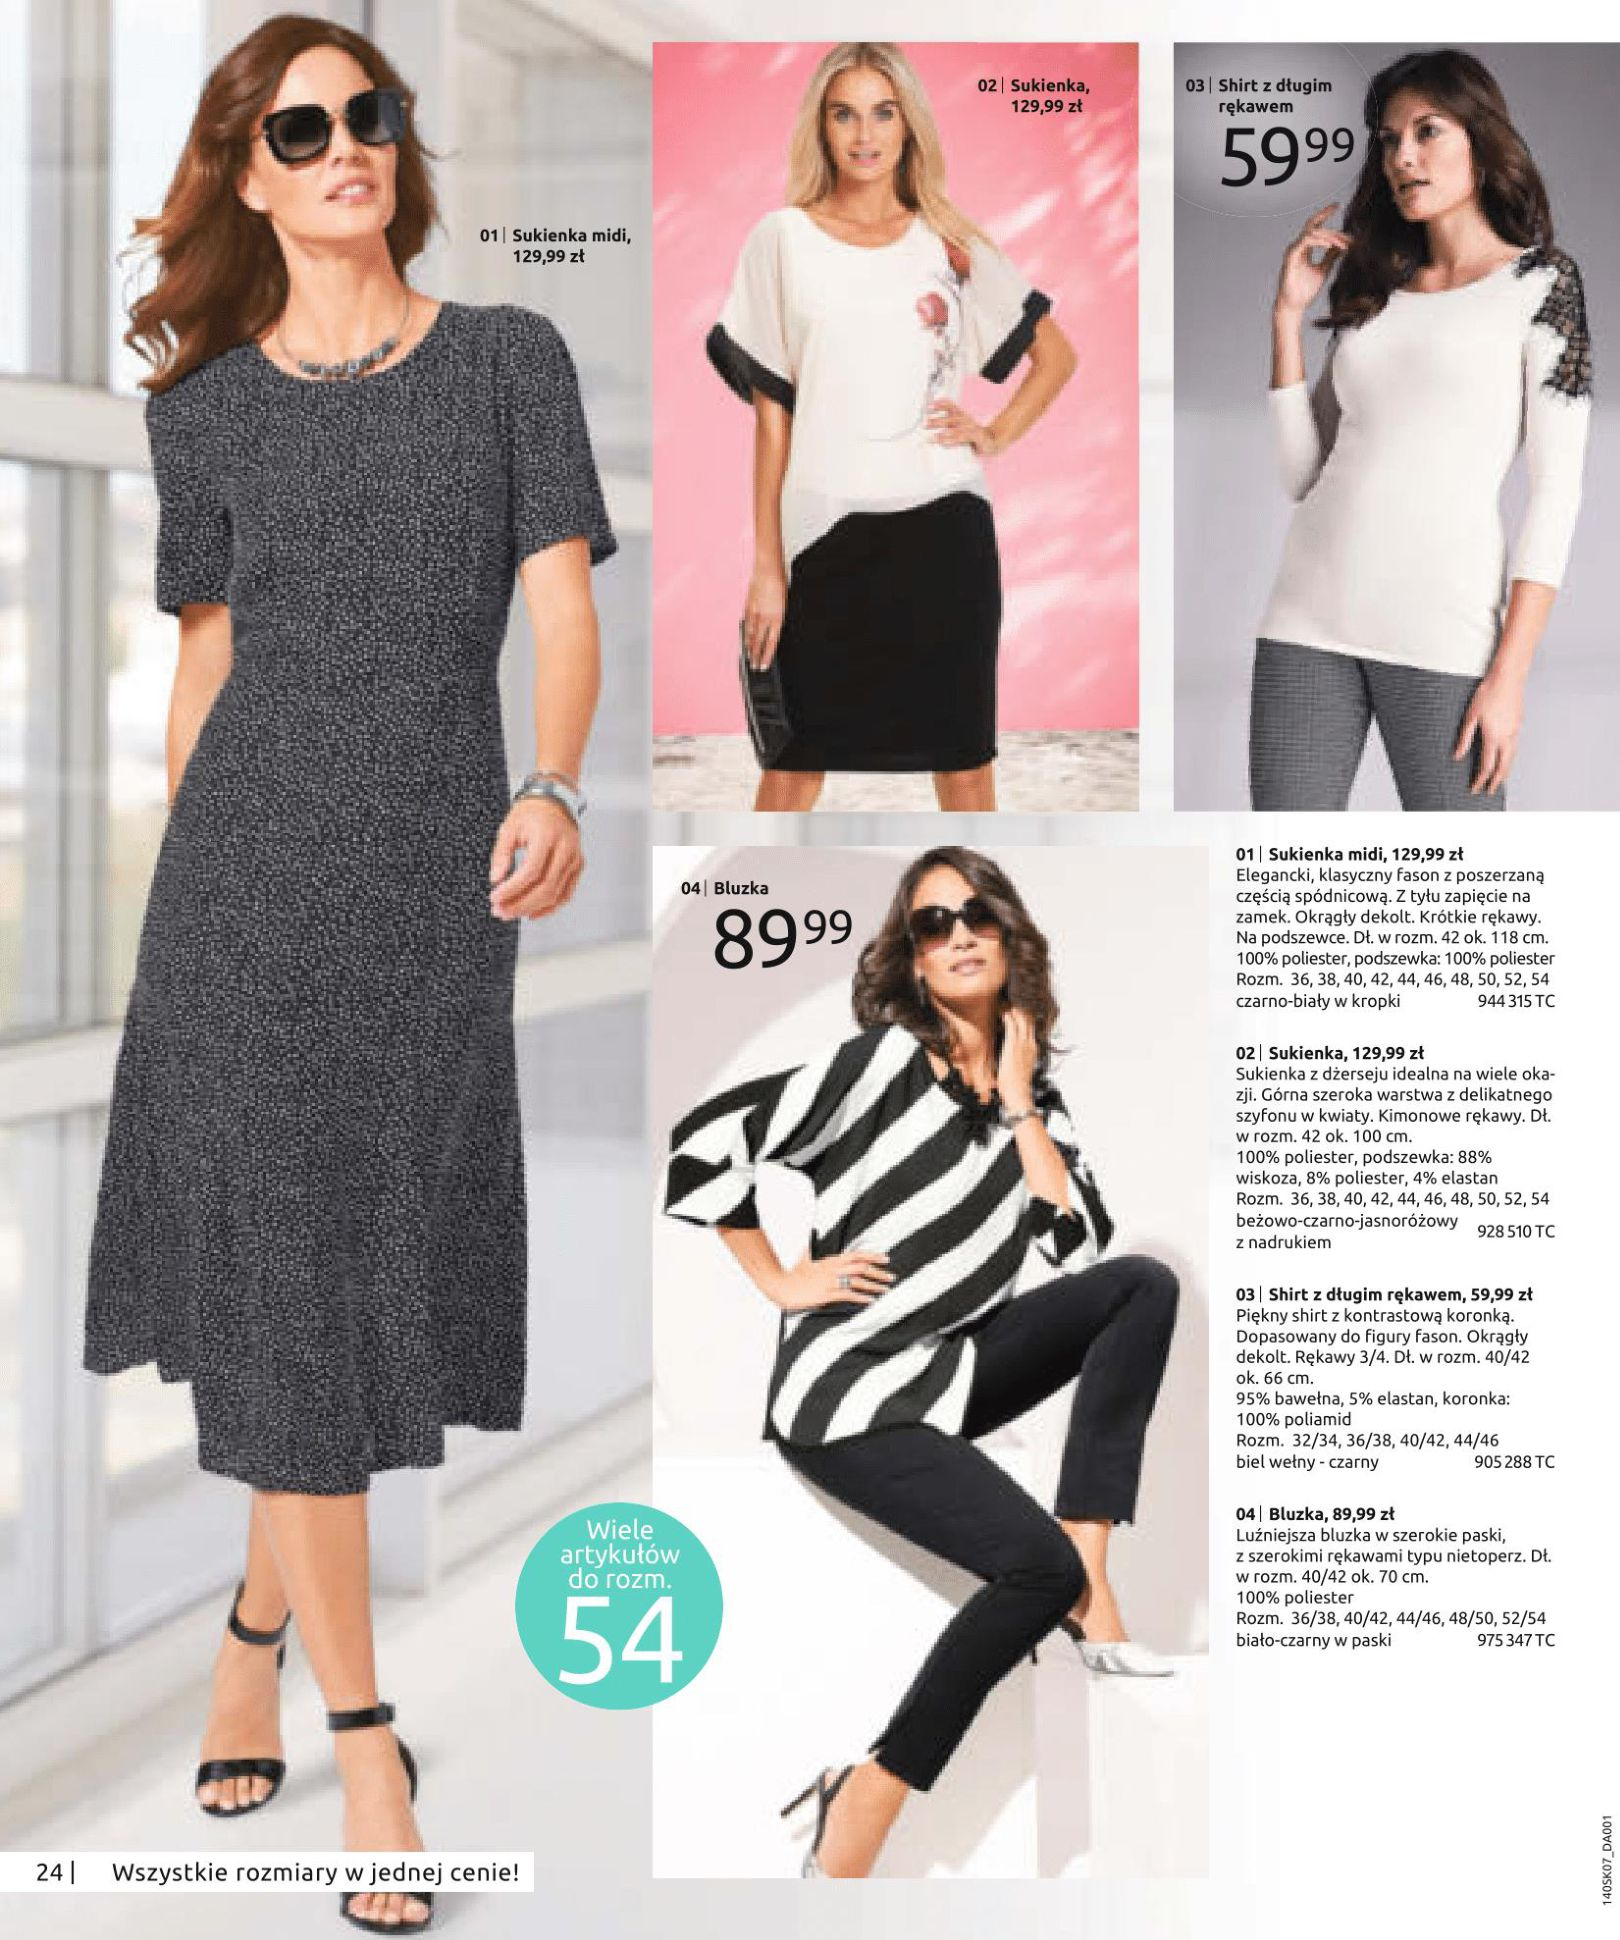 Gazetka Bonprix - Letnie trendy-02.07.2019-15.01.2020-page-26